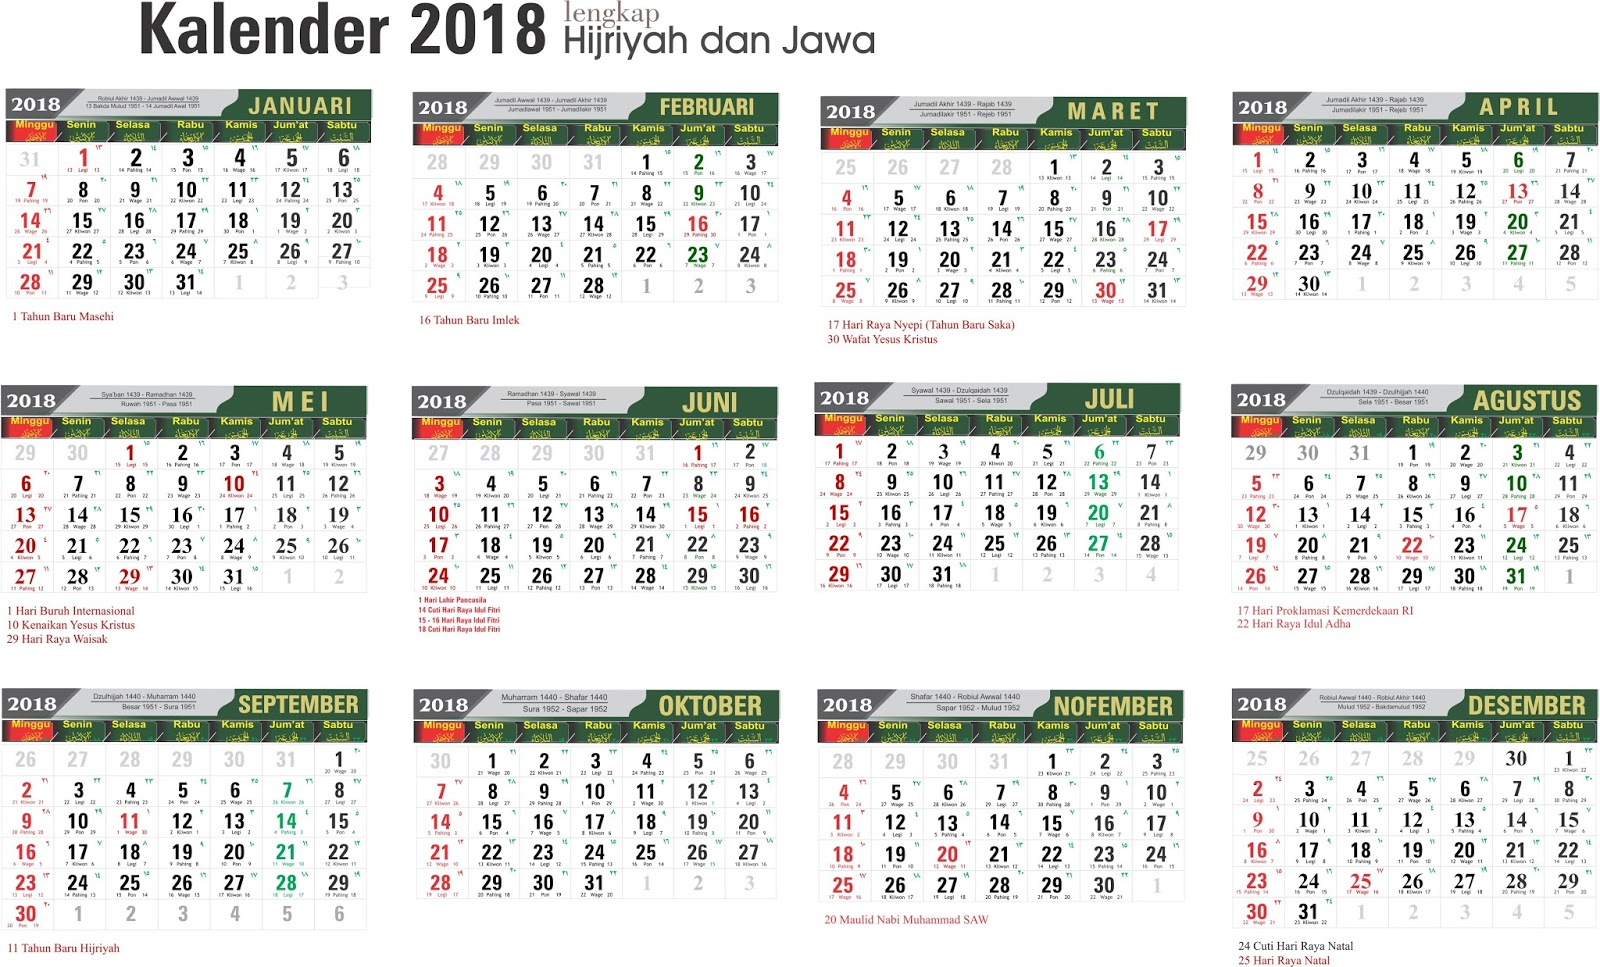 Kalender 2018 Lengkap Hijriyah Dan Jawa Cdr